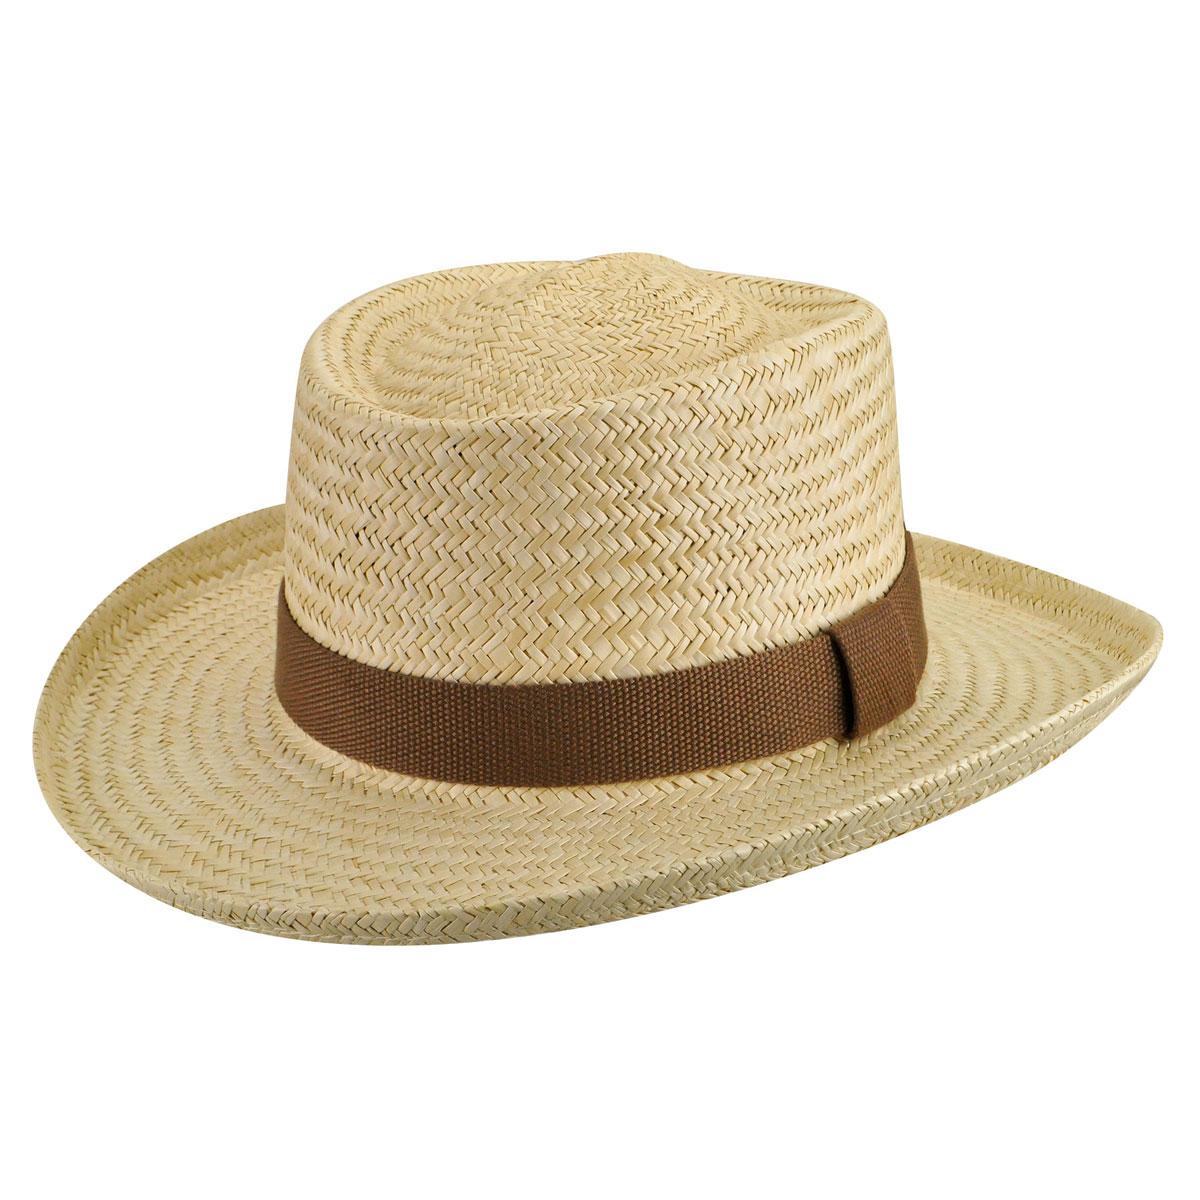 Steampunk Hats | Top Hats | Bowler Ashton Gambler $60.00 AT vintagedancer.com